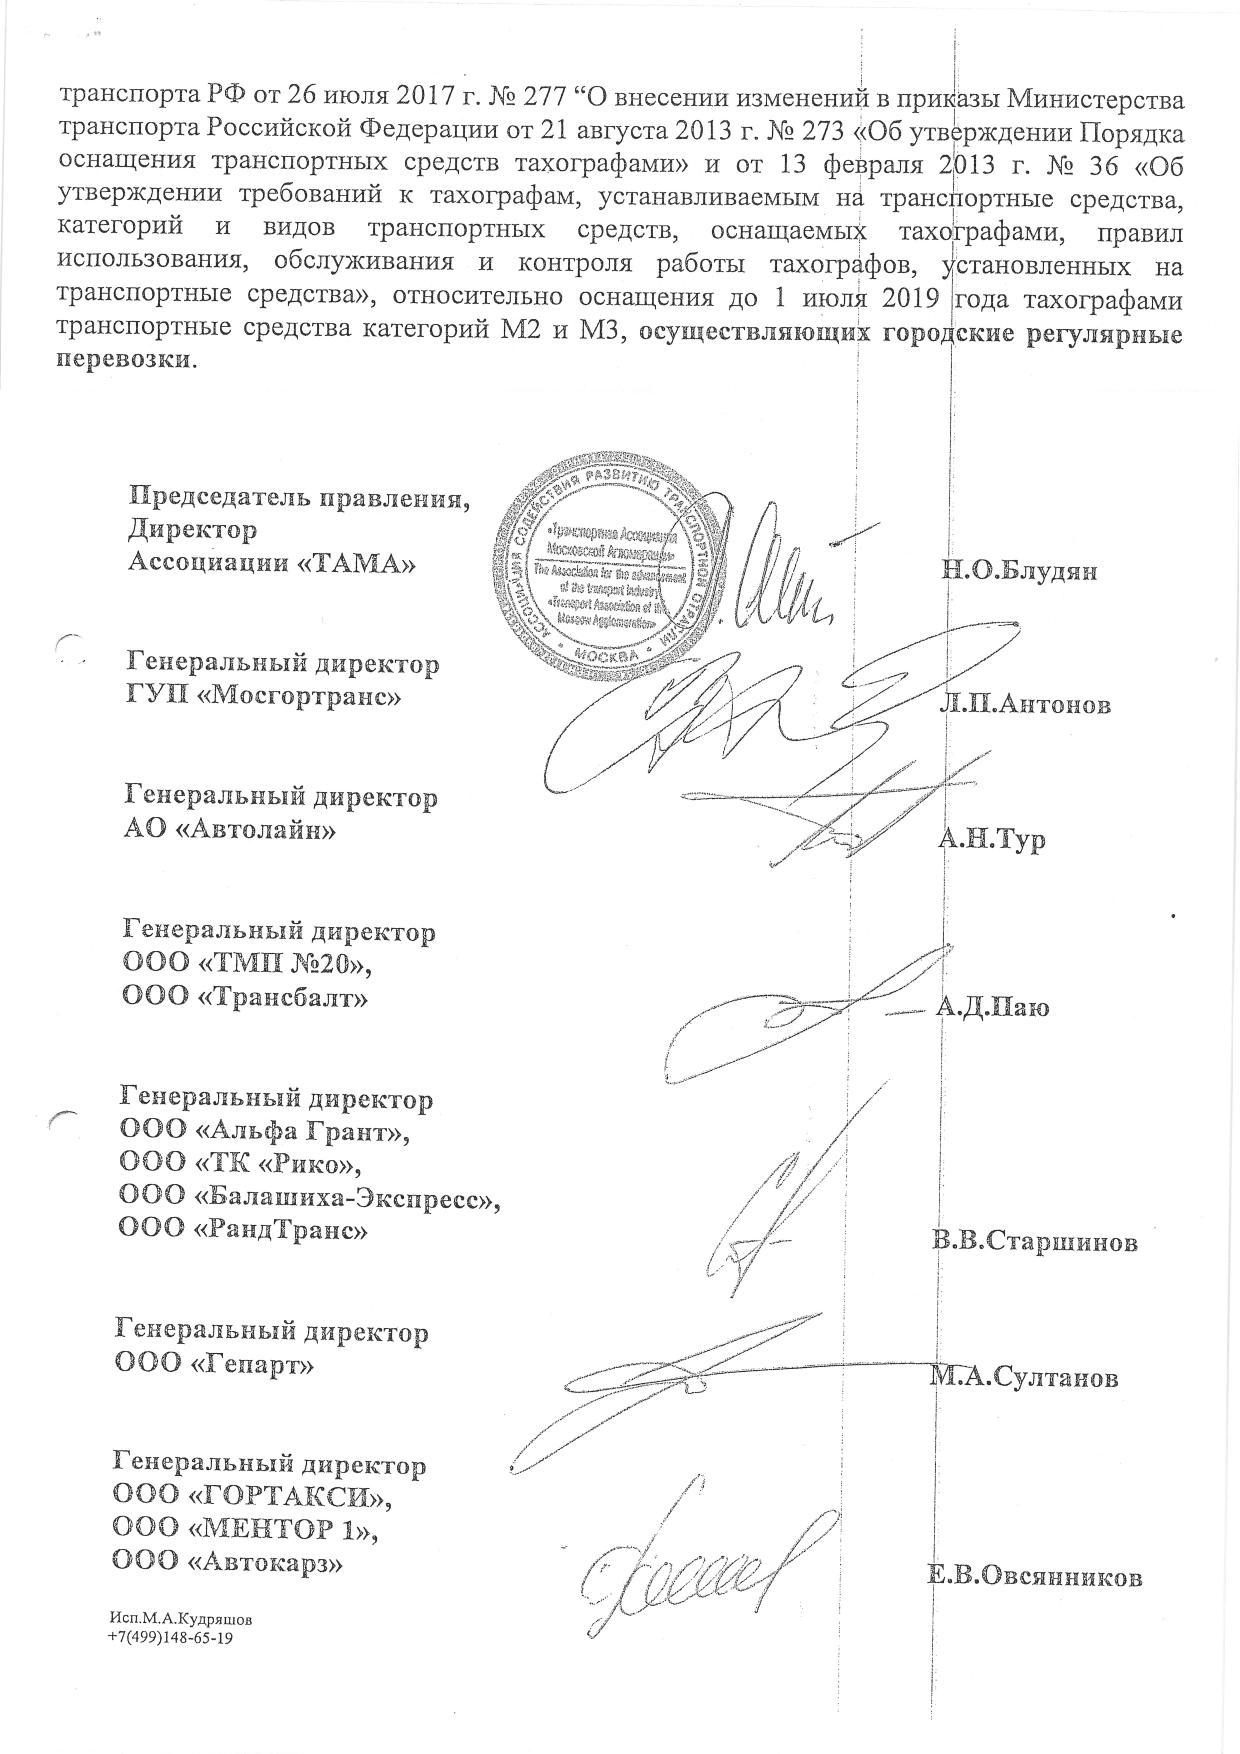 Письмо Дитриху Е.И.от 19.07.2018 _page-0002